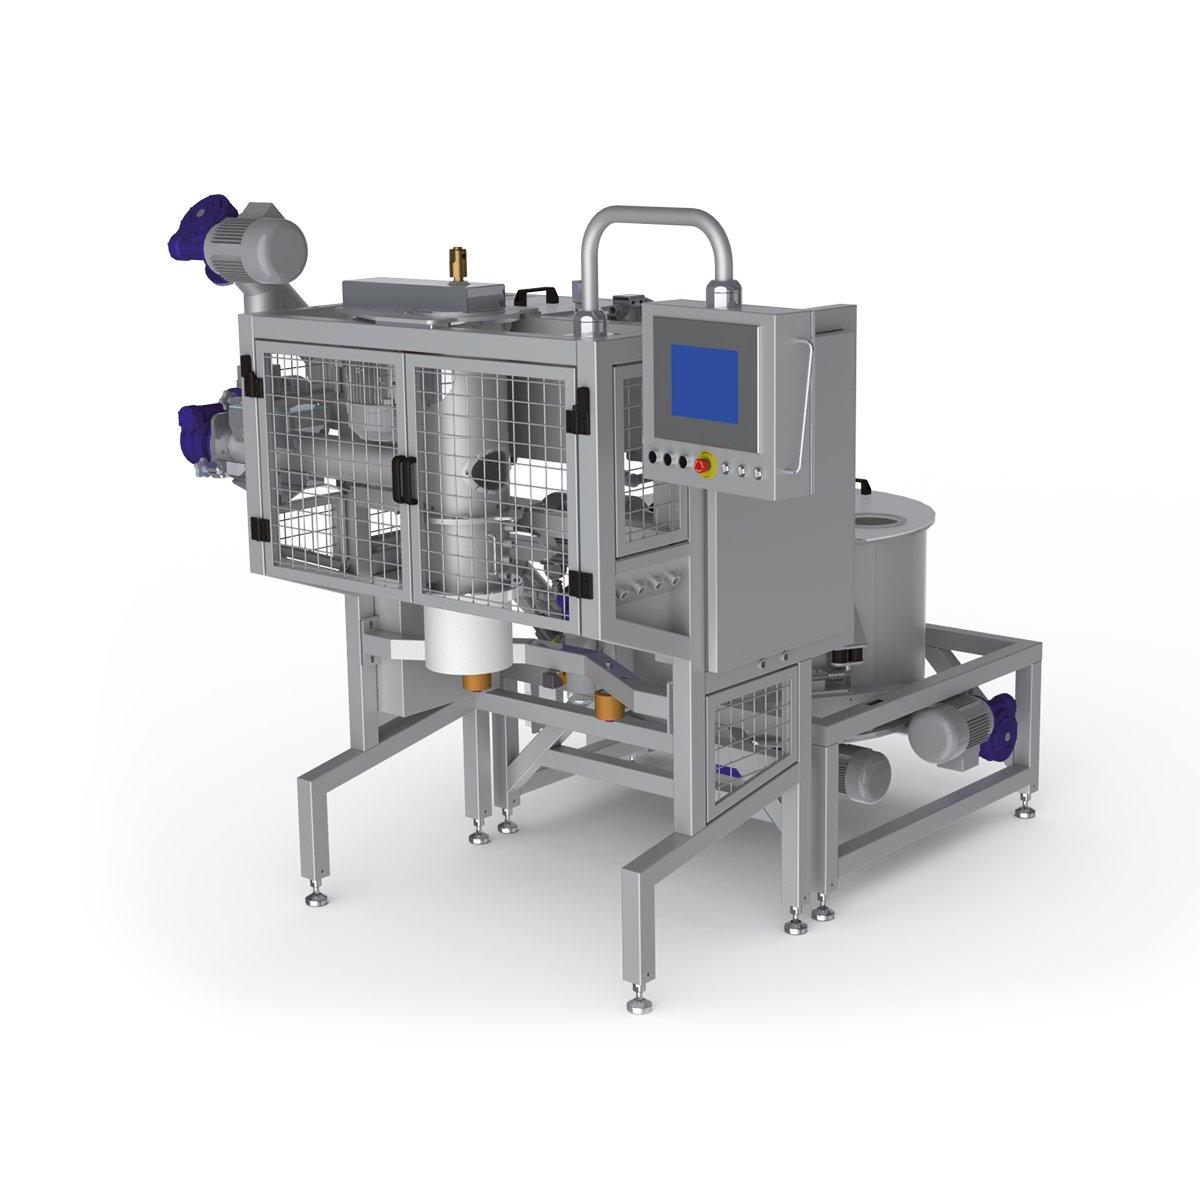 Idromix pre-mixing system